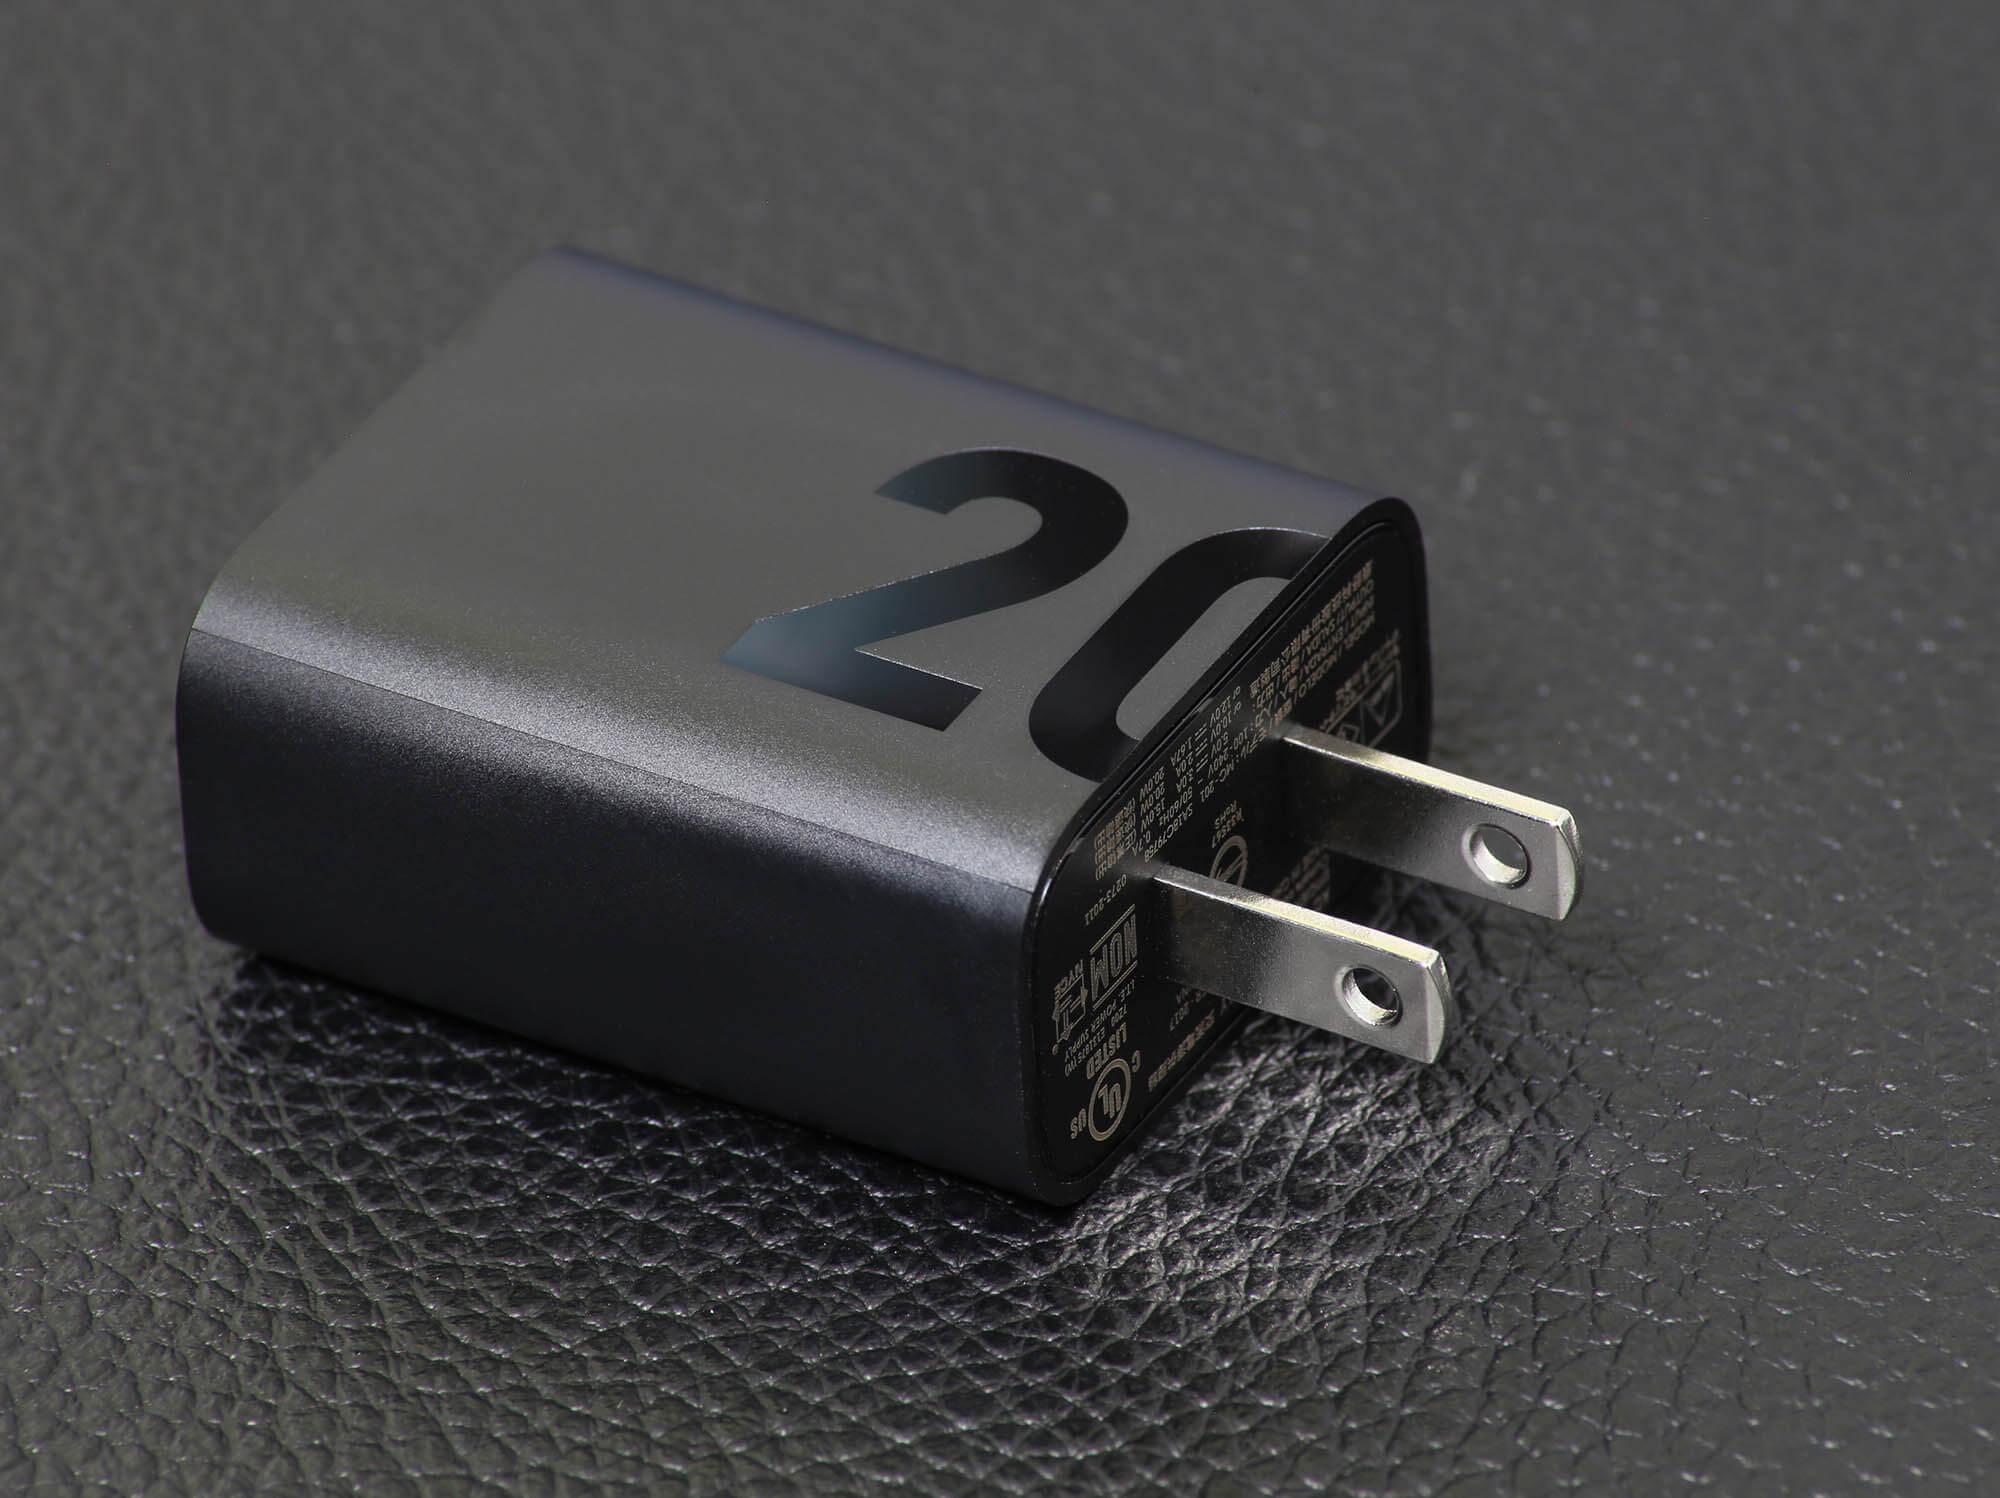 moto g30の充電器は最大出力地をデザインのモチーフとして使用